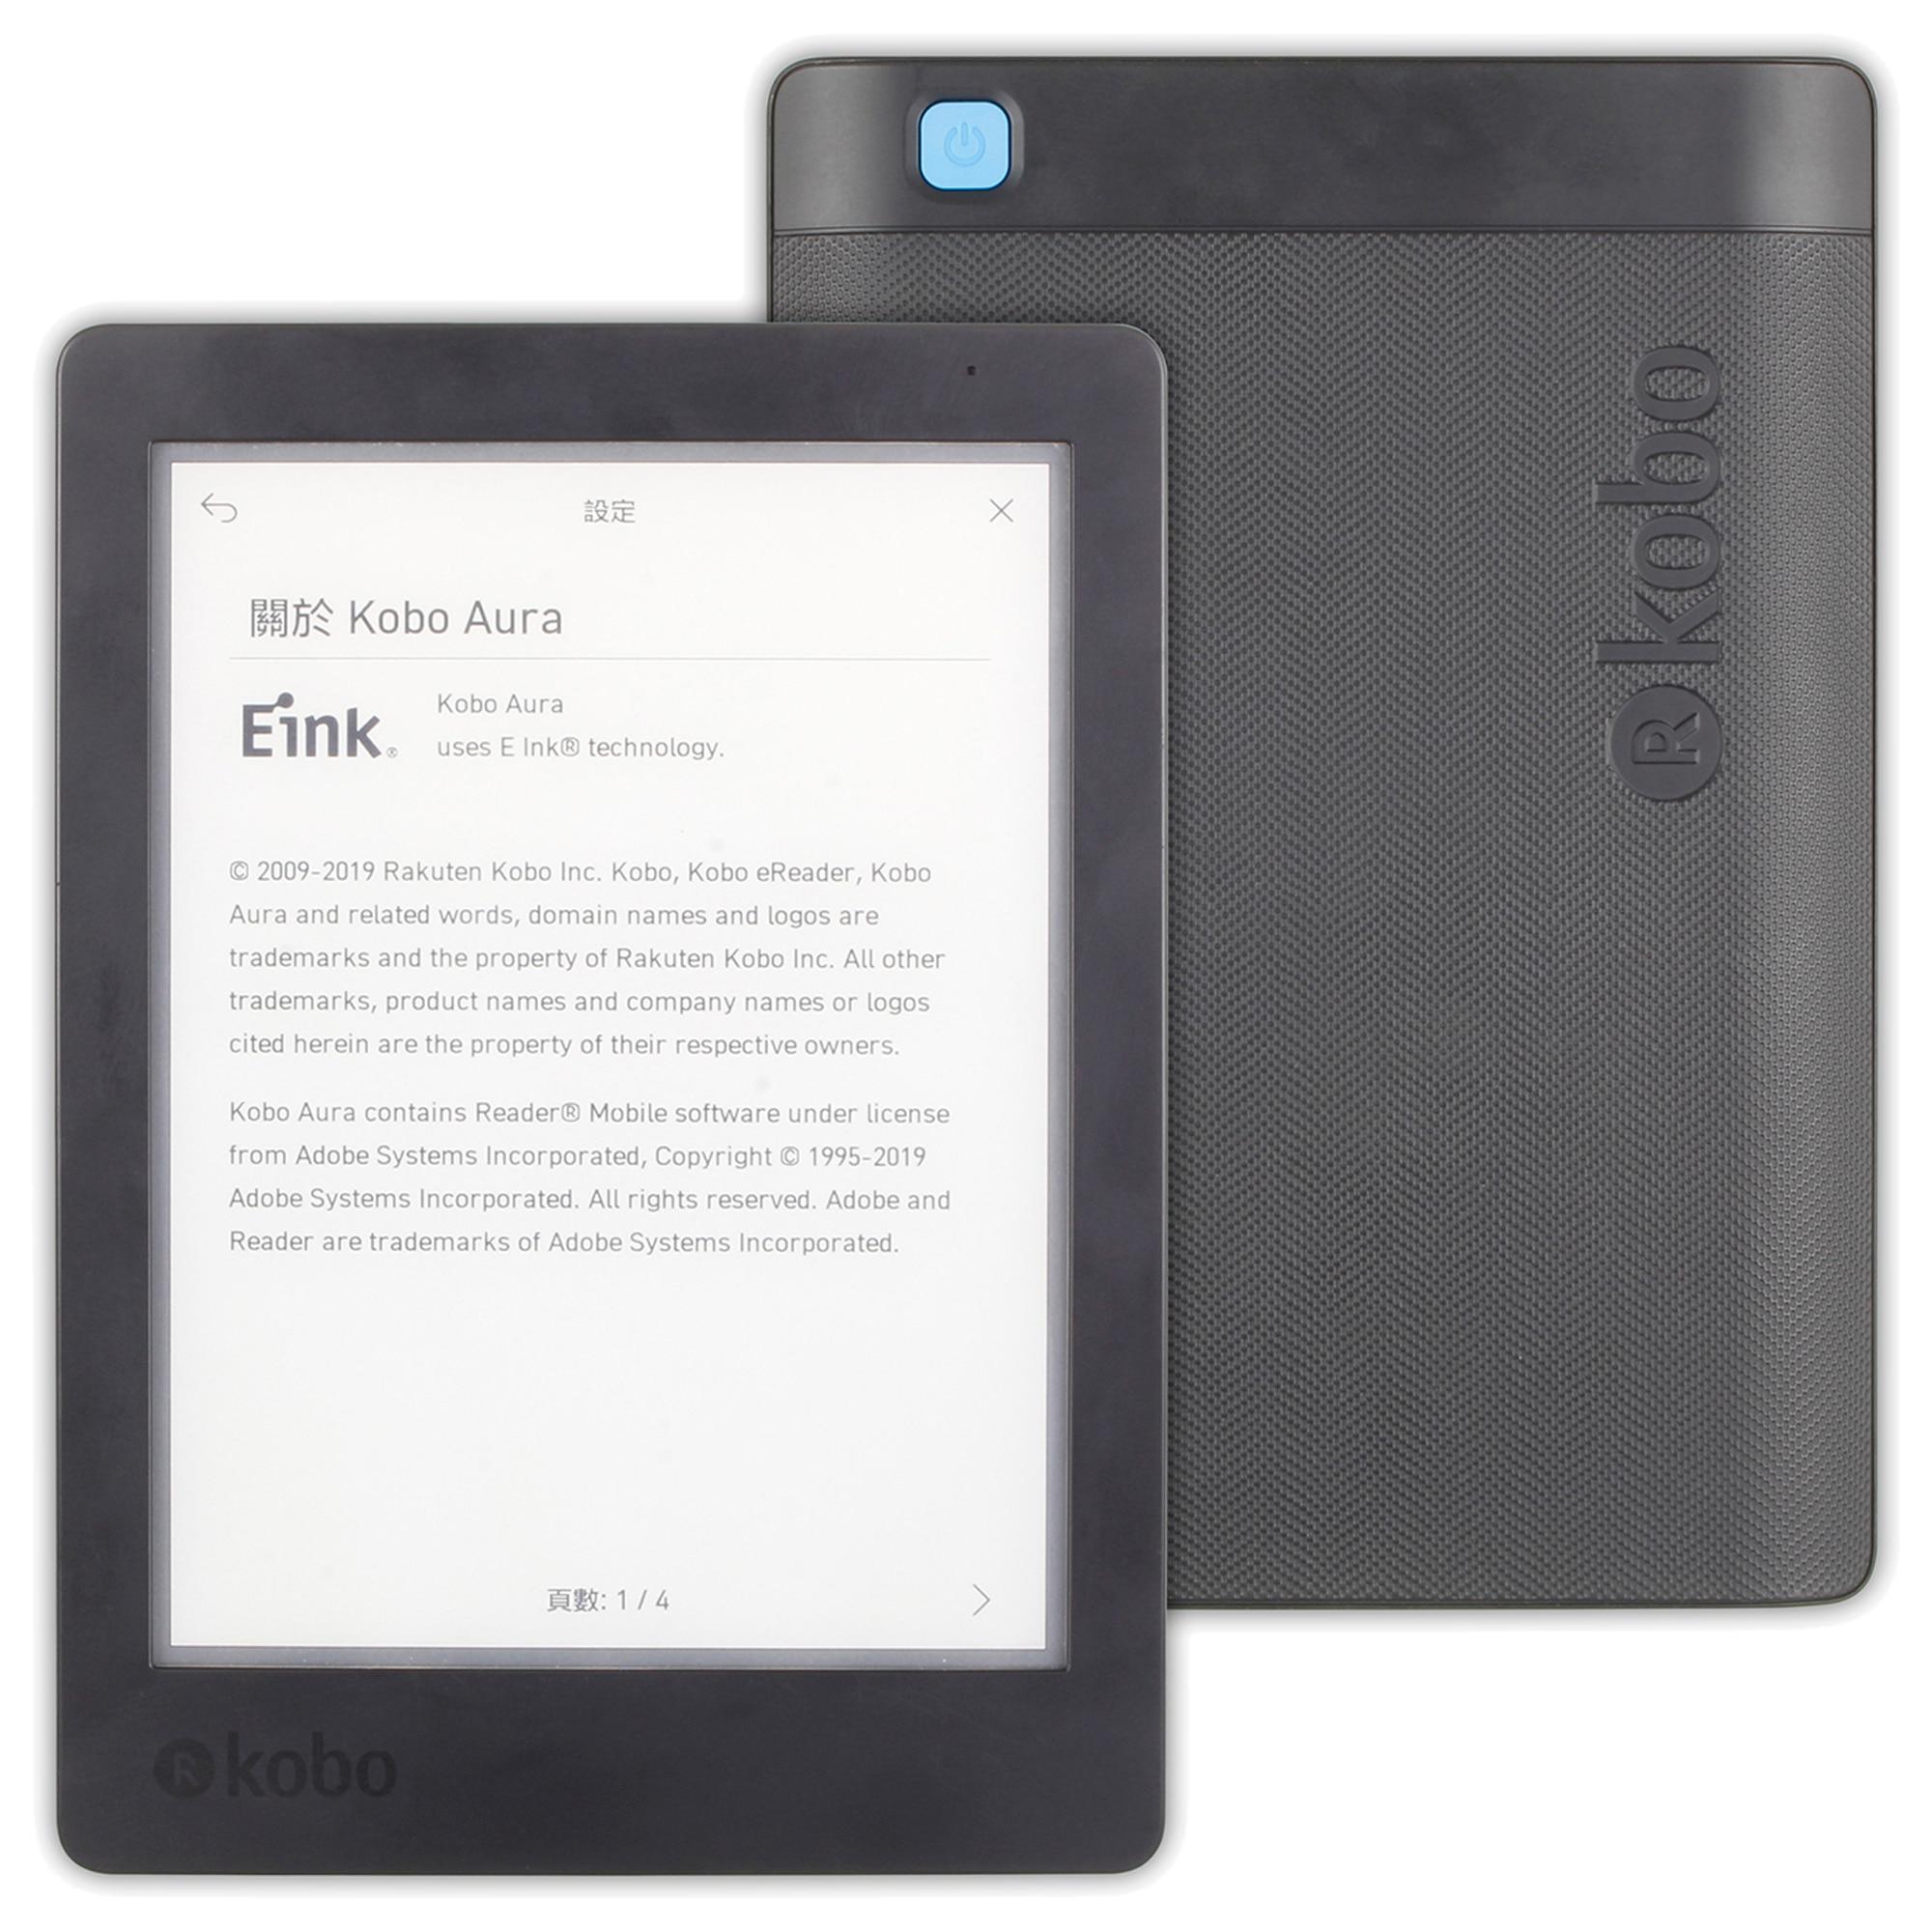 e-book Kobo Aura Edition 2 ebook reader Carta e-ink 6 inch resolution 1024x768 has Light 212 ppi e Book Reader WiFi 4GB Memory